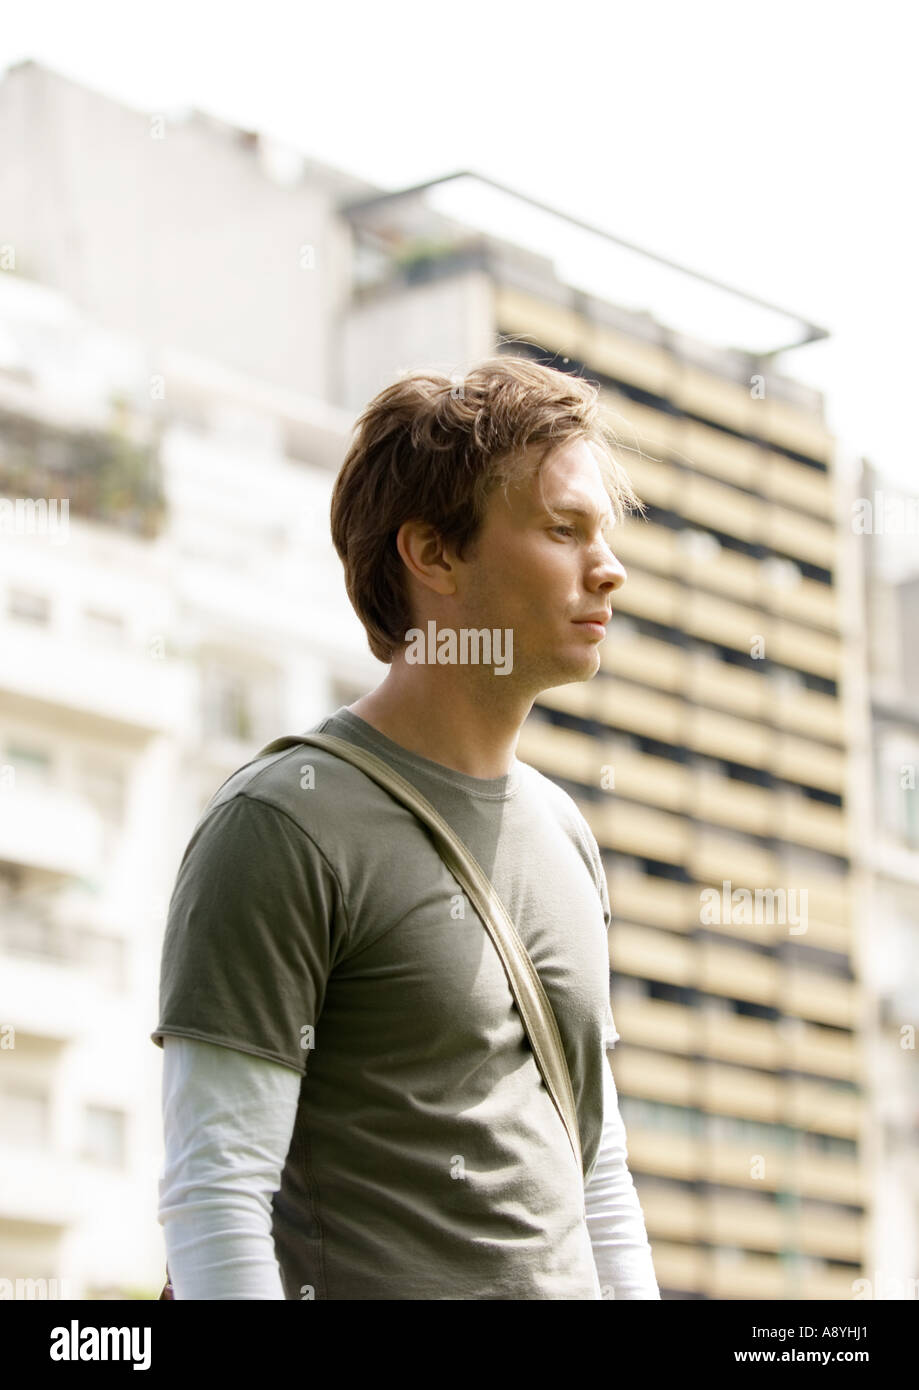 Young man in urban setting - Stock Image